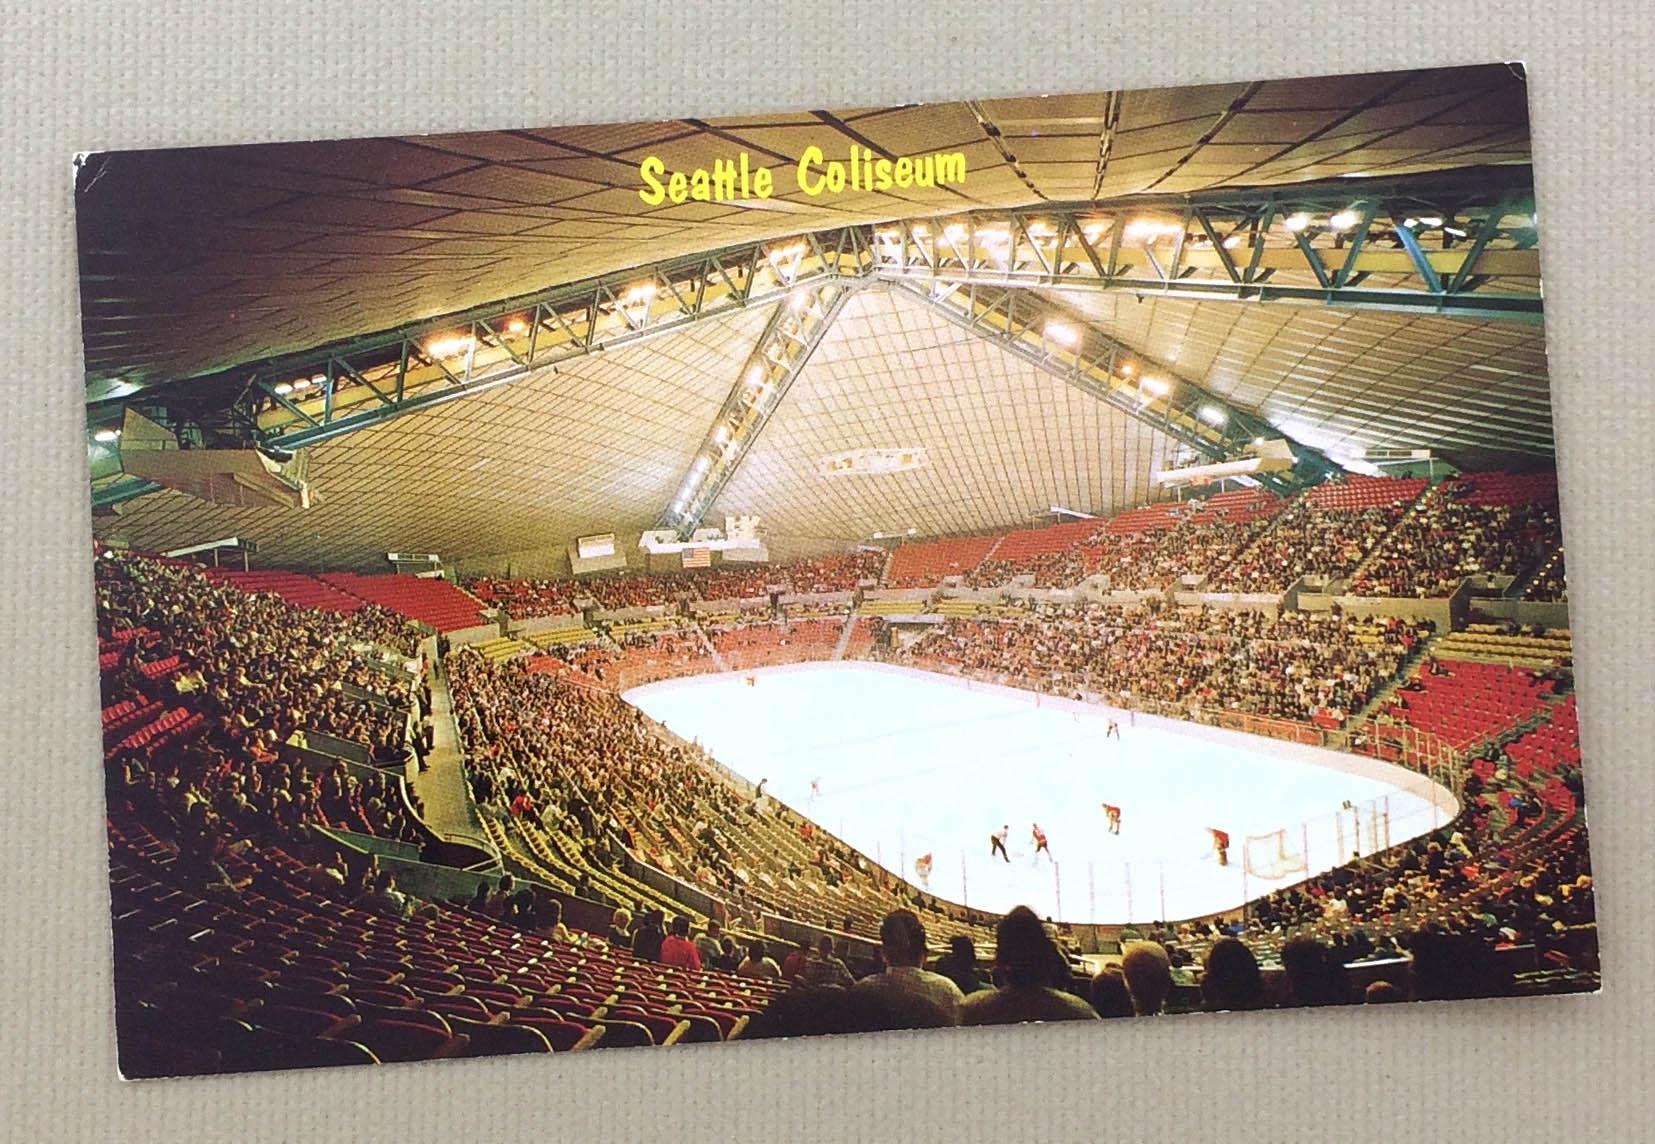 Seattle Coliseum Arena Postcard